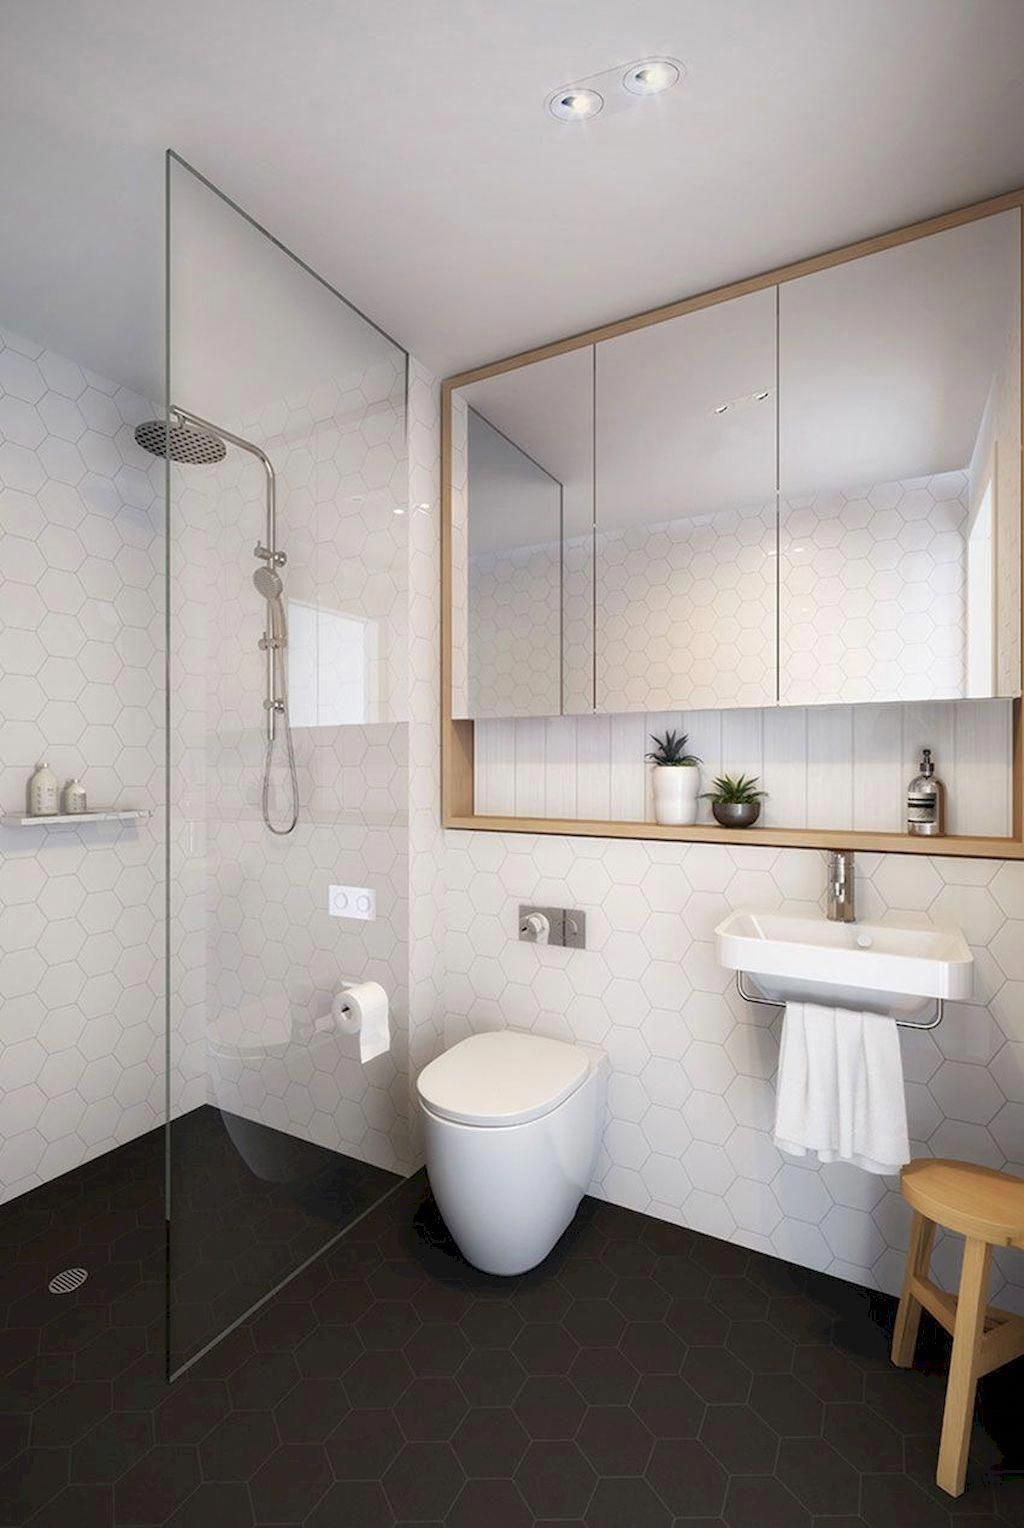 Master Bathroom Ideas On A Tight Budget, Bathroom Ideas ...